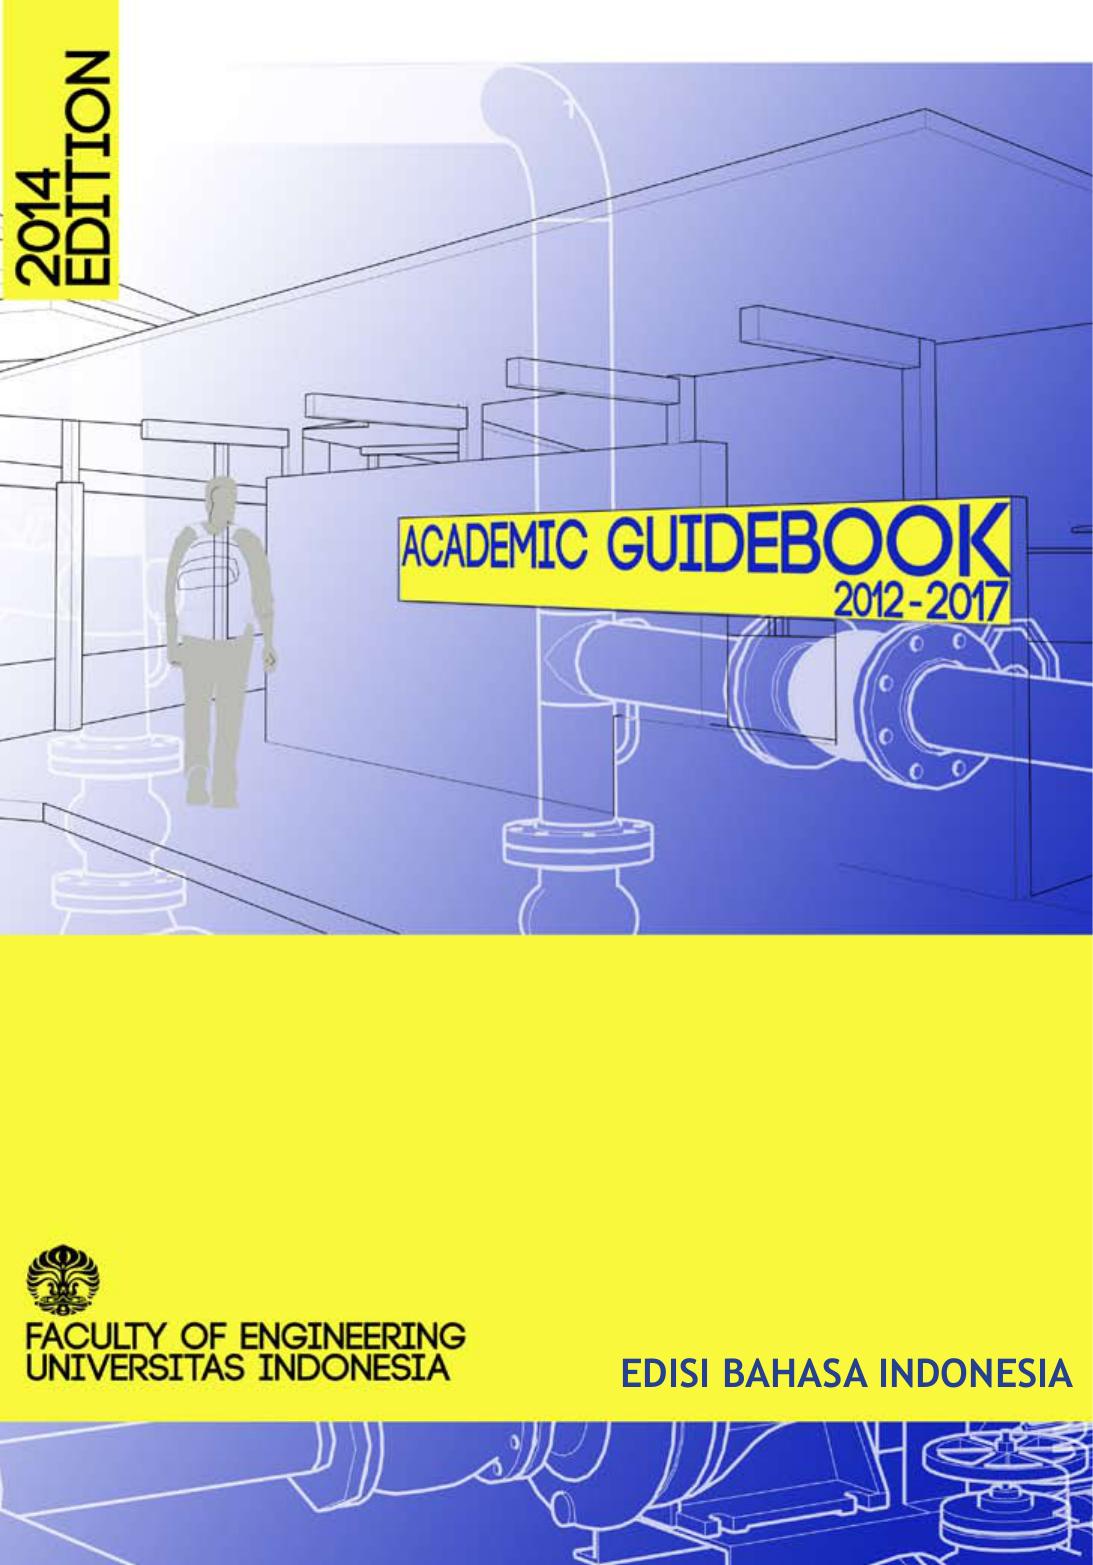 Edisi Bahasa Indonesia Fakultas Teknik Universitas Description Monolithic Microwave Integrated Circuit Msa0686 Fixedpng